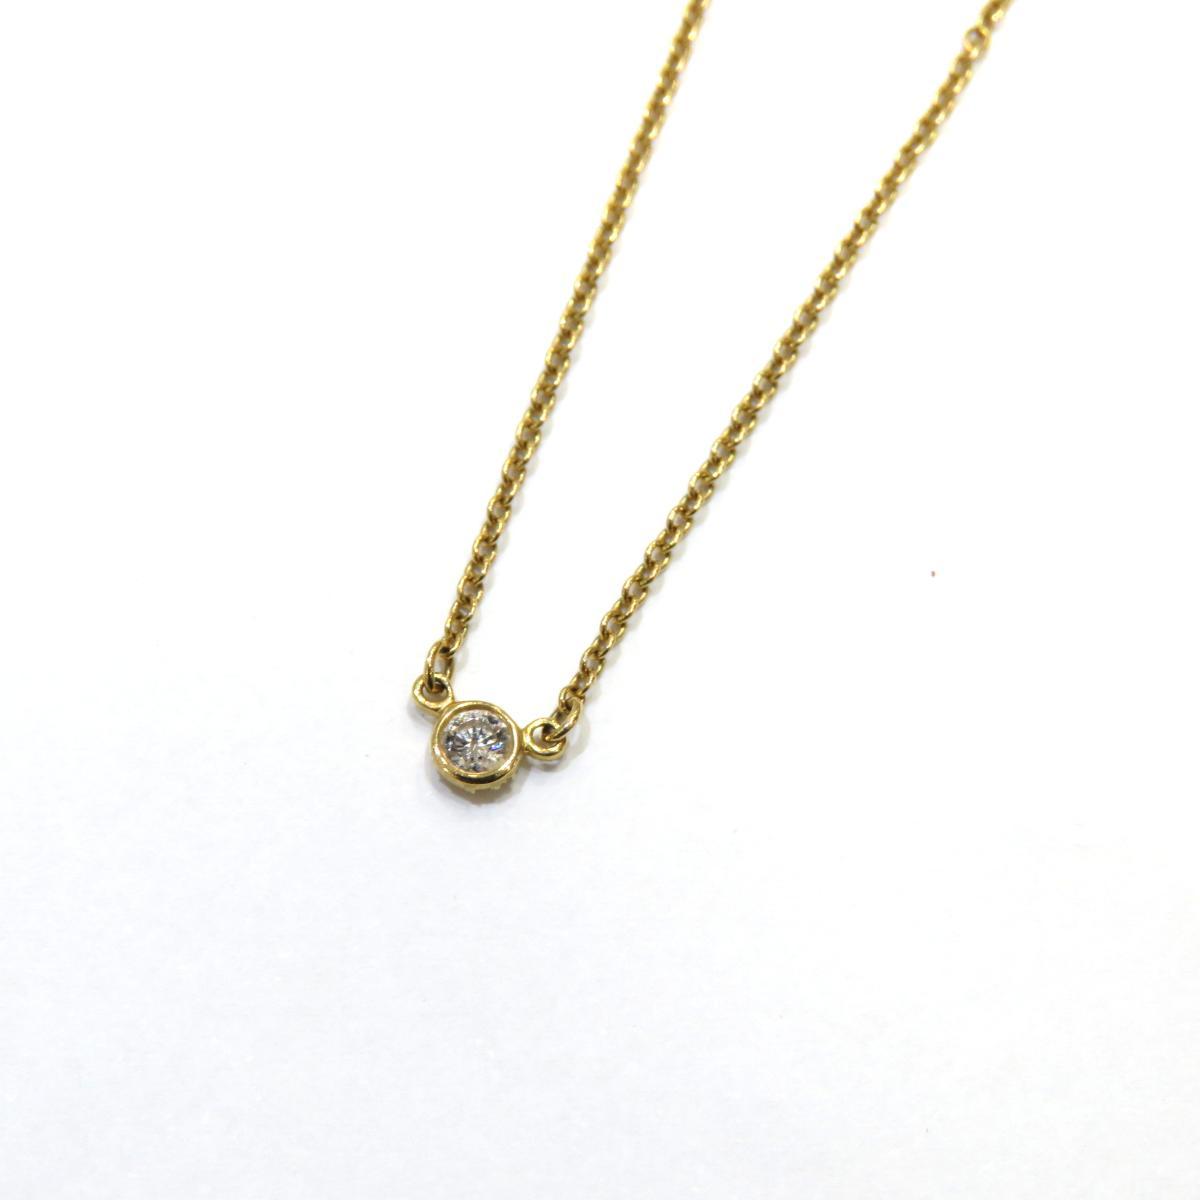 TIFFANY&CO(ティファニー)/バイザヤード ネックレス レディース/ネックレス//K18YG(750)イエローゴールド×ダイヤモンド/【ランクA】【中古】